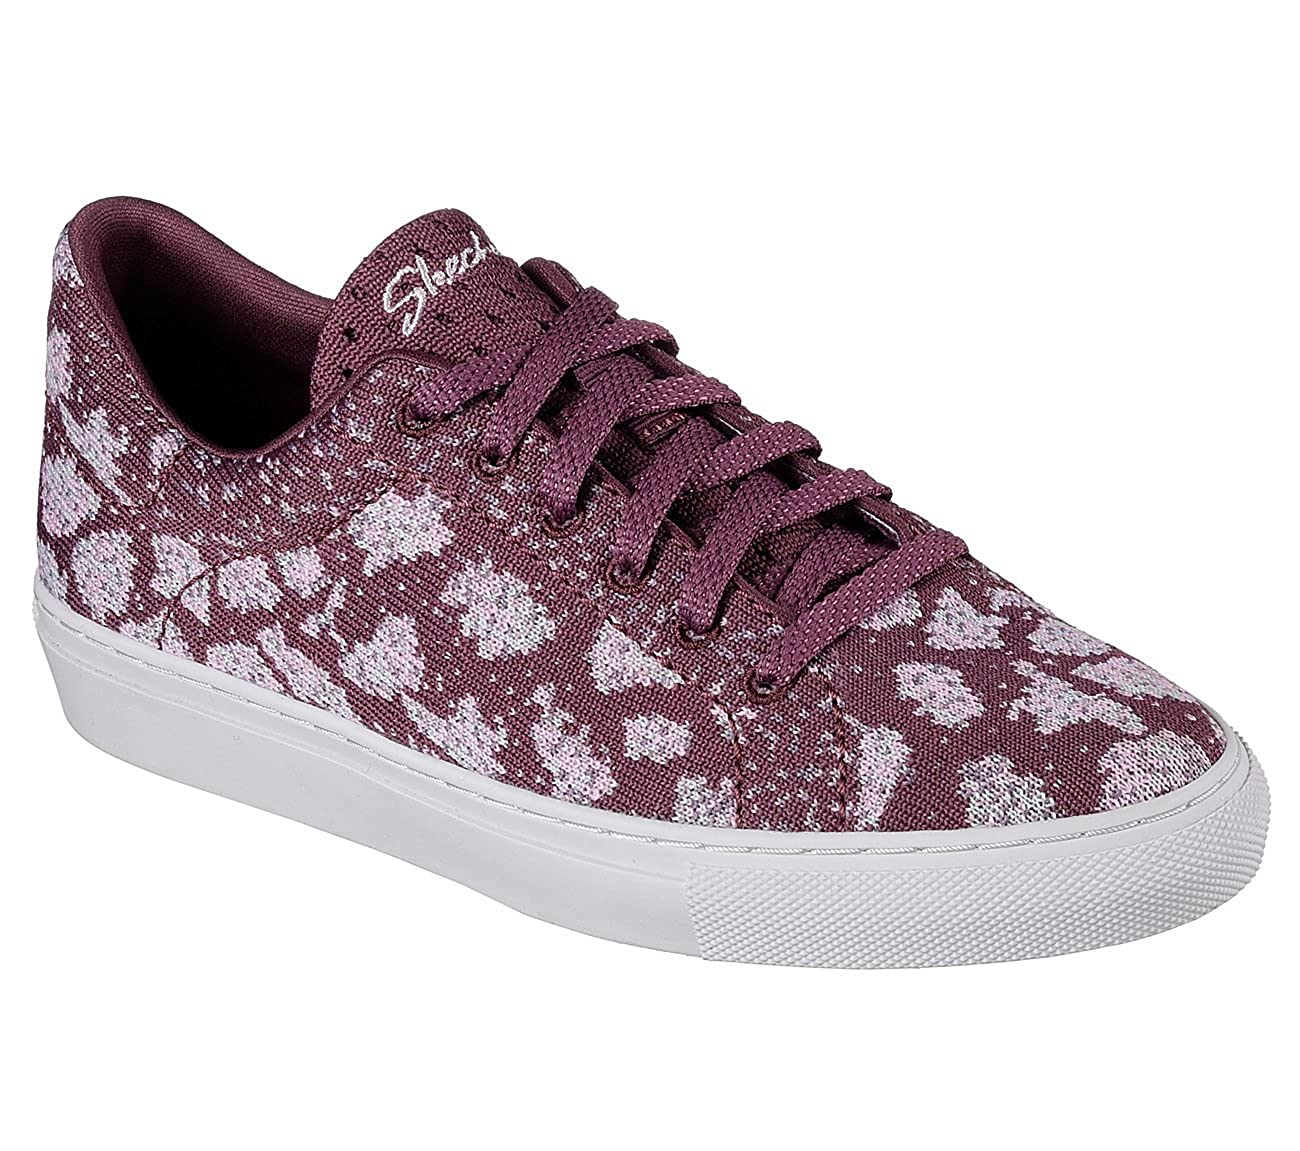 Skechers Skechers Vaso Ramo femmes paniers violet 6.5  achats en ligne et magasin de mode